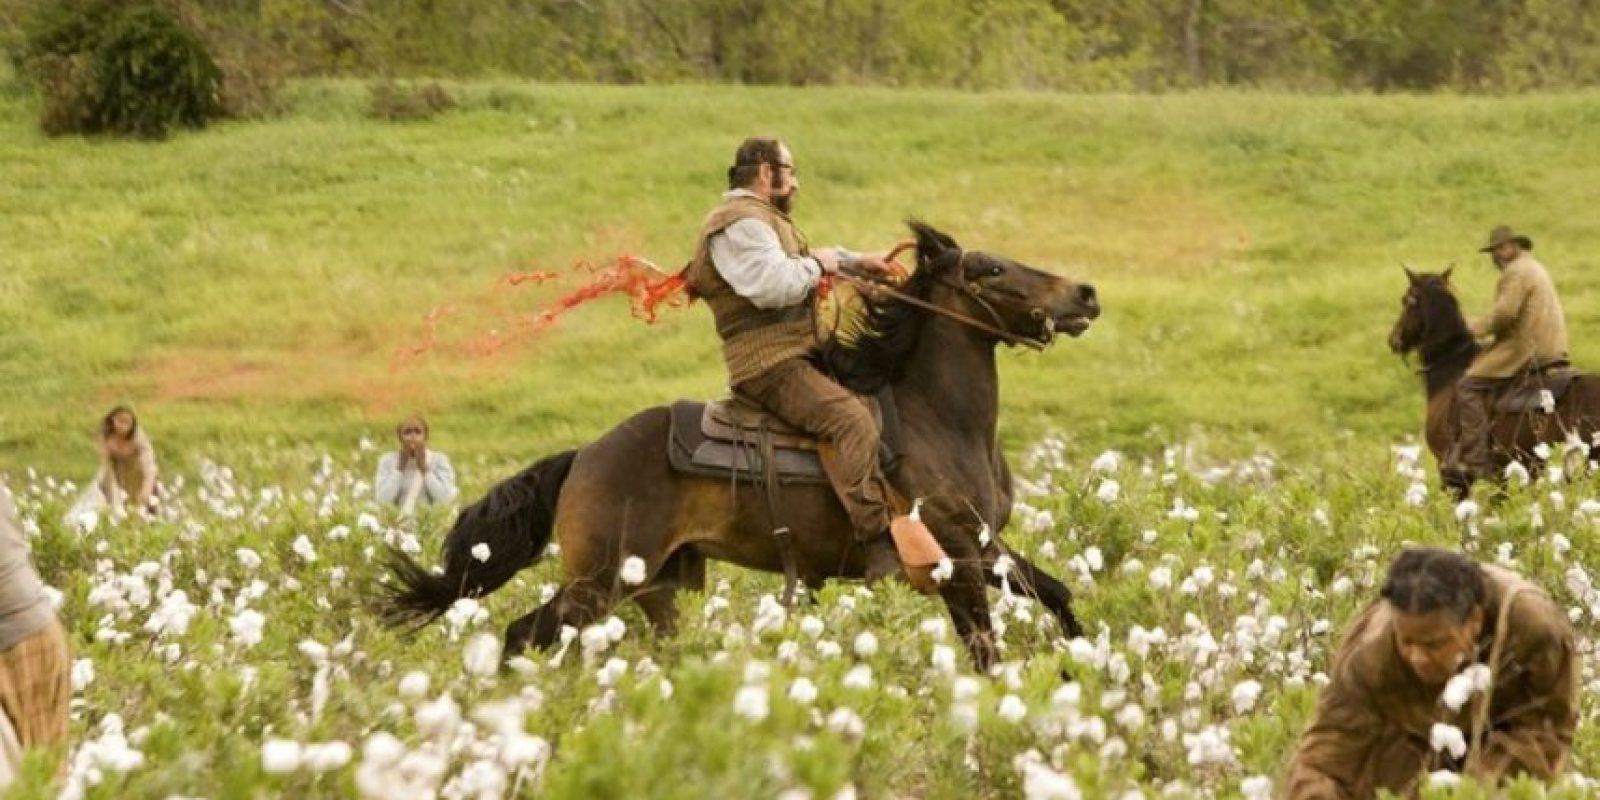 En caballo Foto:Django